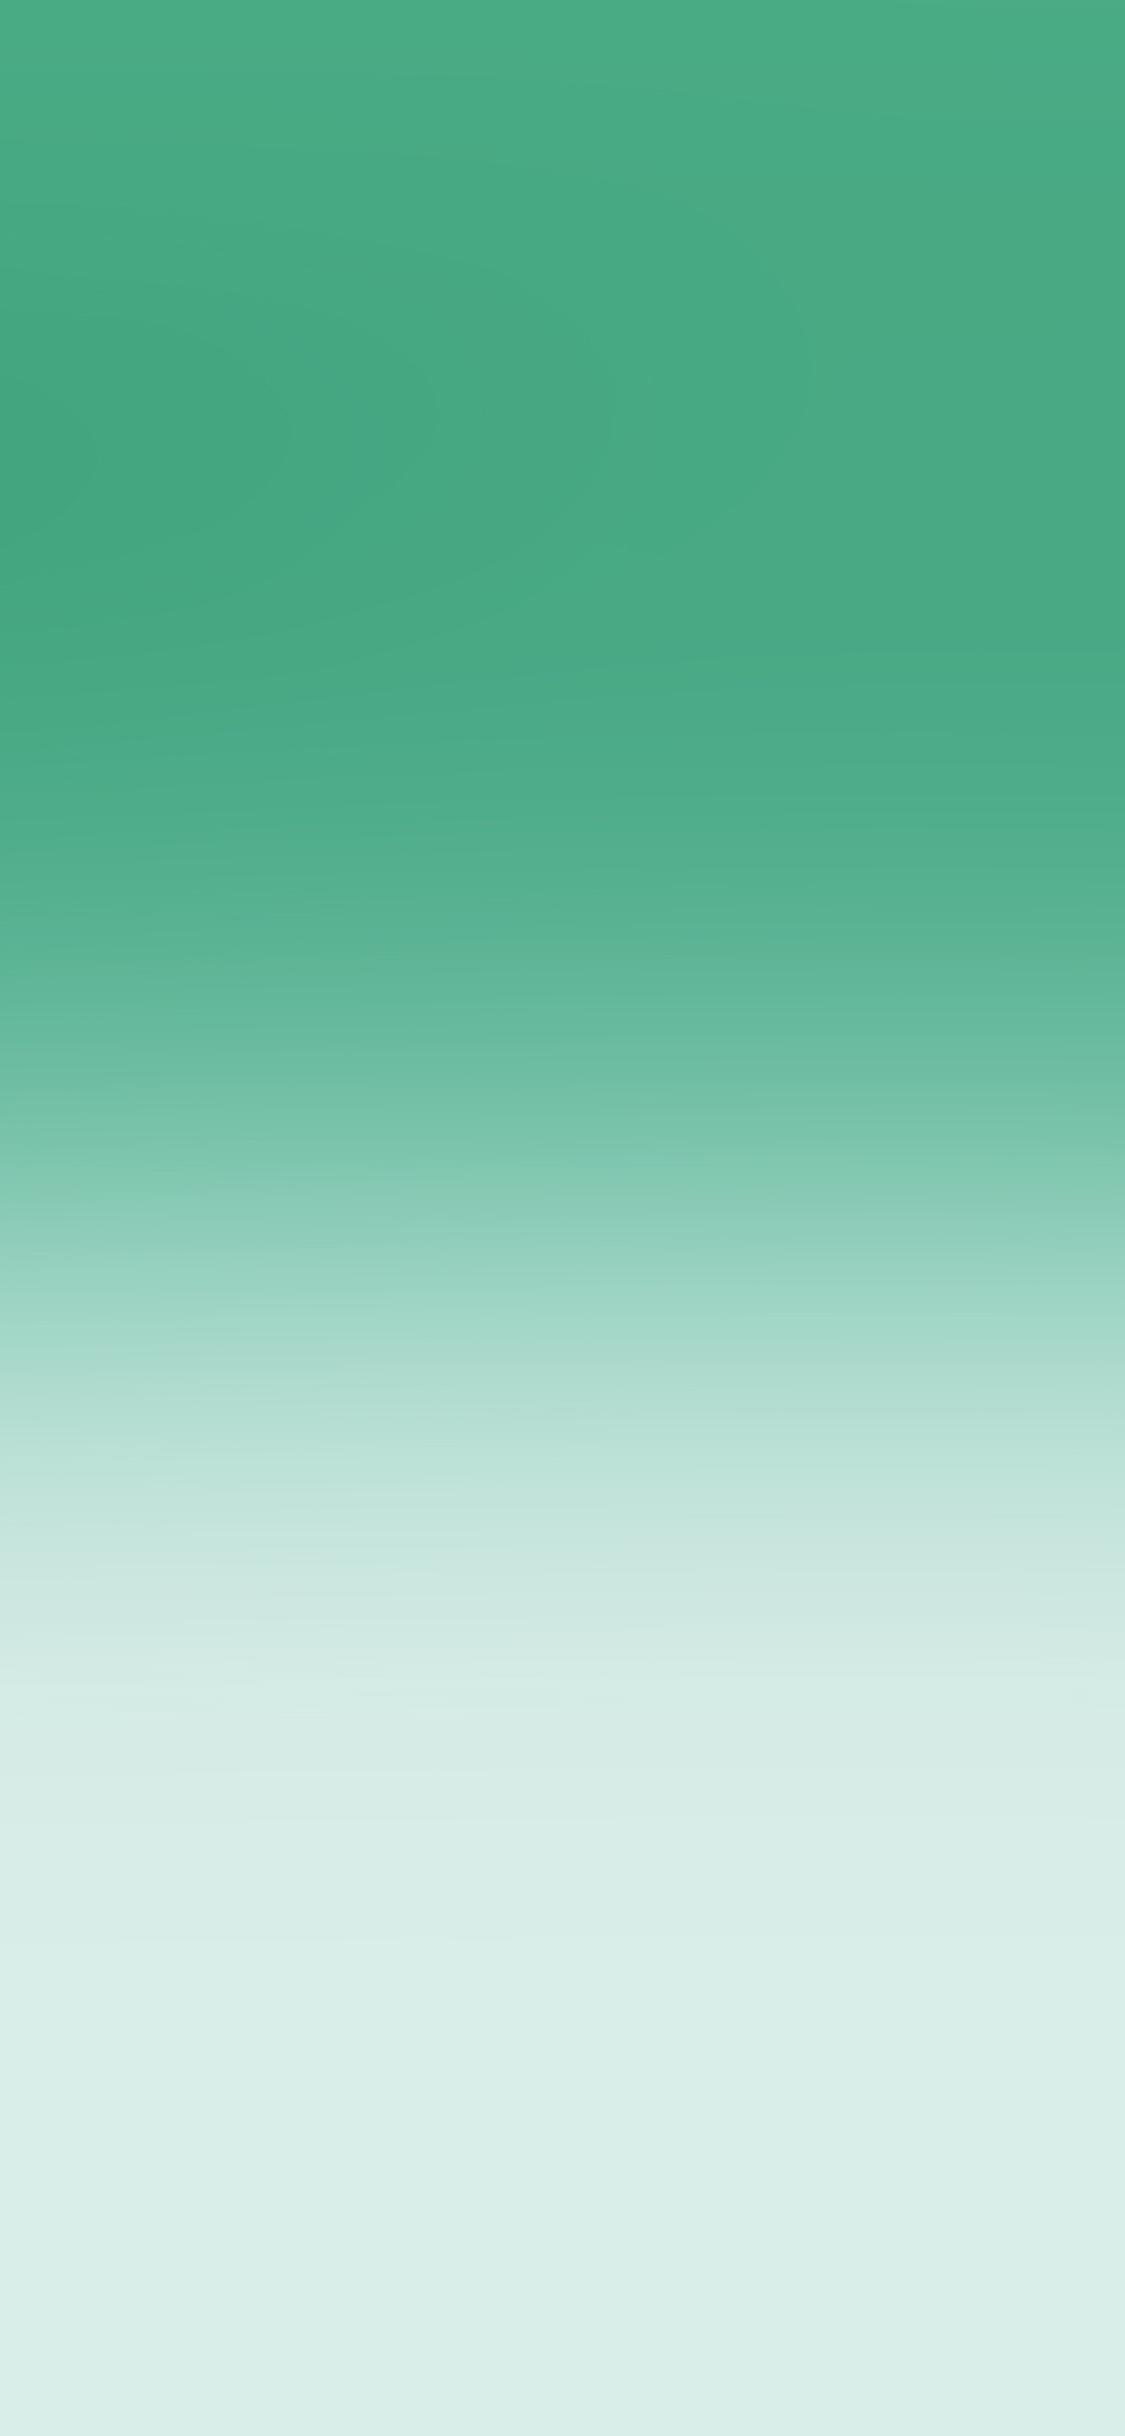 iPhoneXpapers.com-Apple-iPhone-wallpaper-sf86-green-ocean-sky-love-gradation-blur